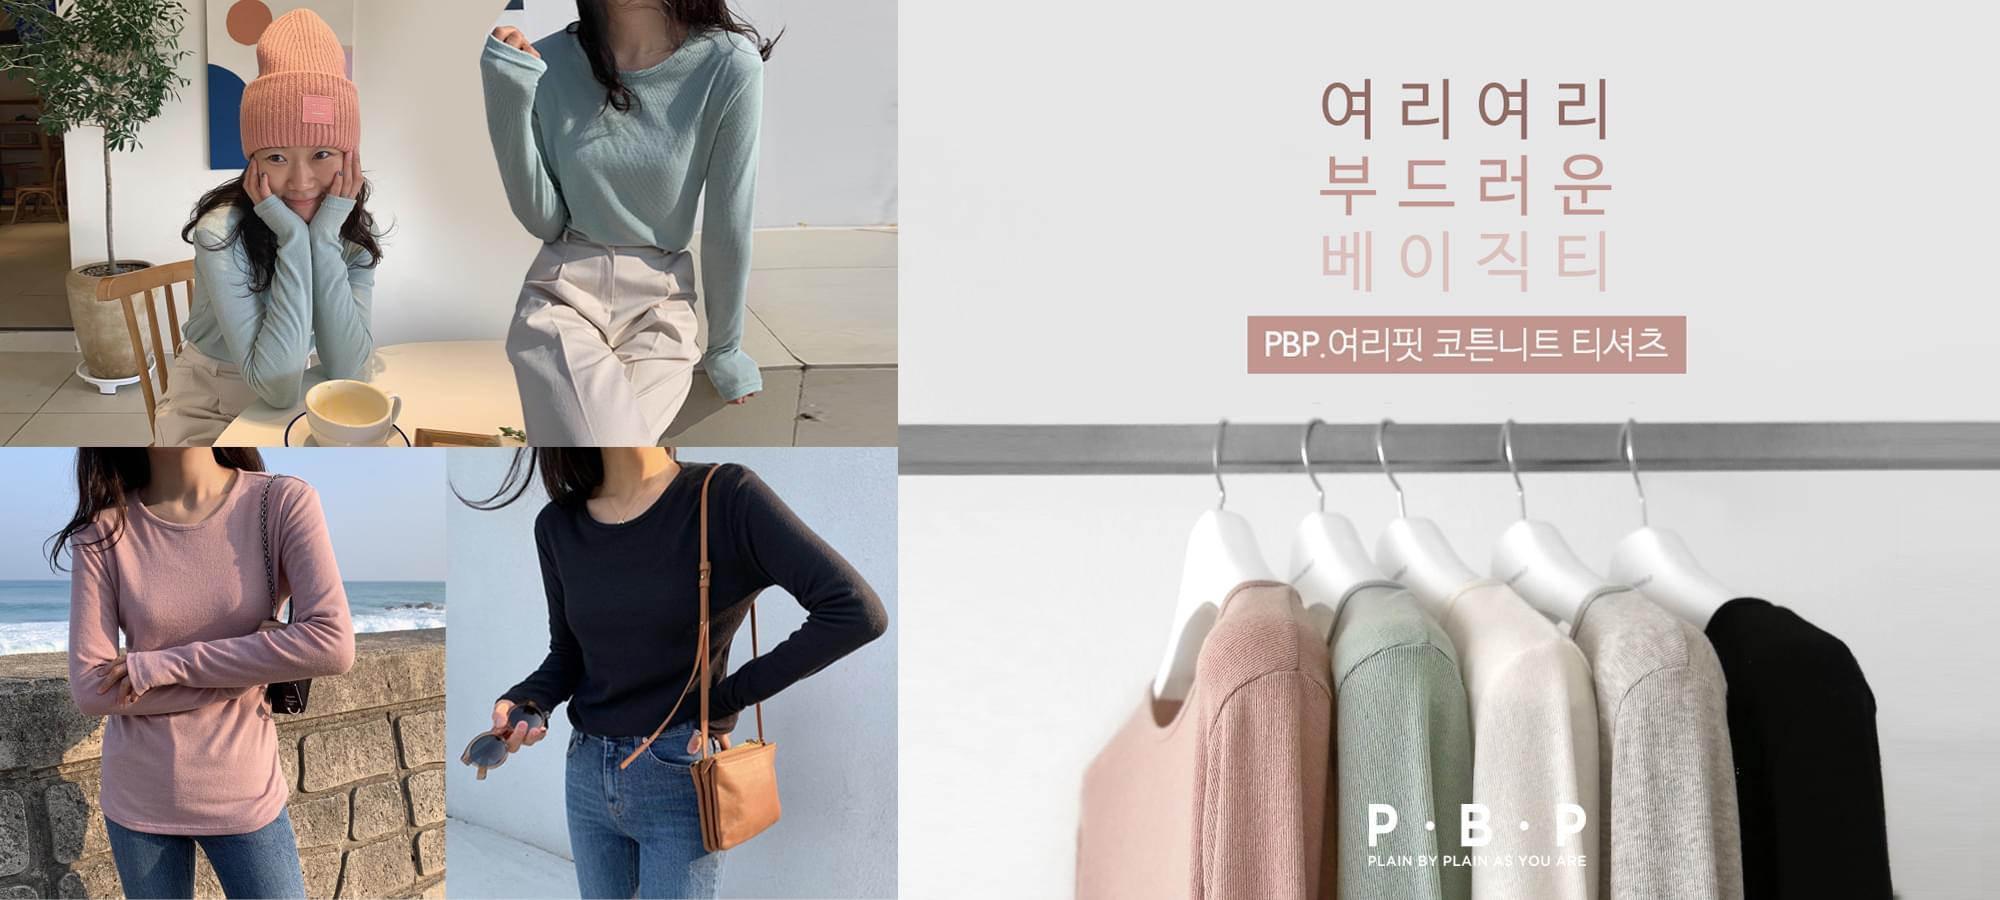 PBP.Polyester cotton knit T-shirt